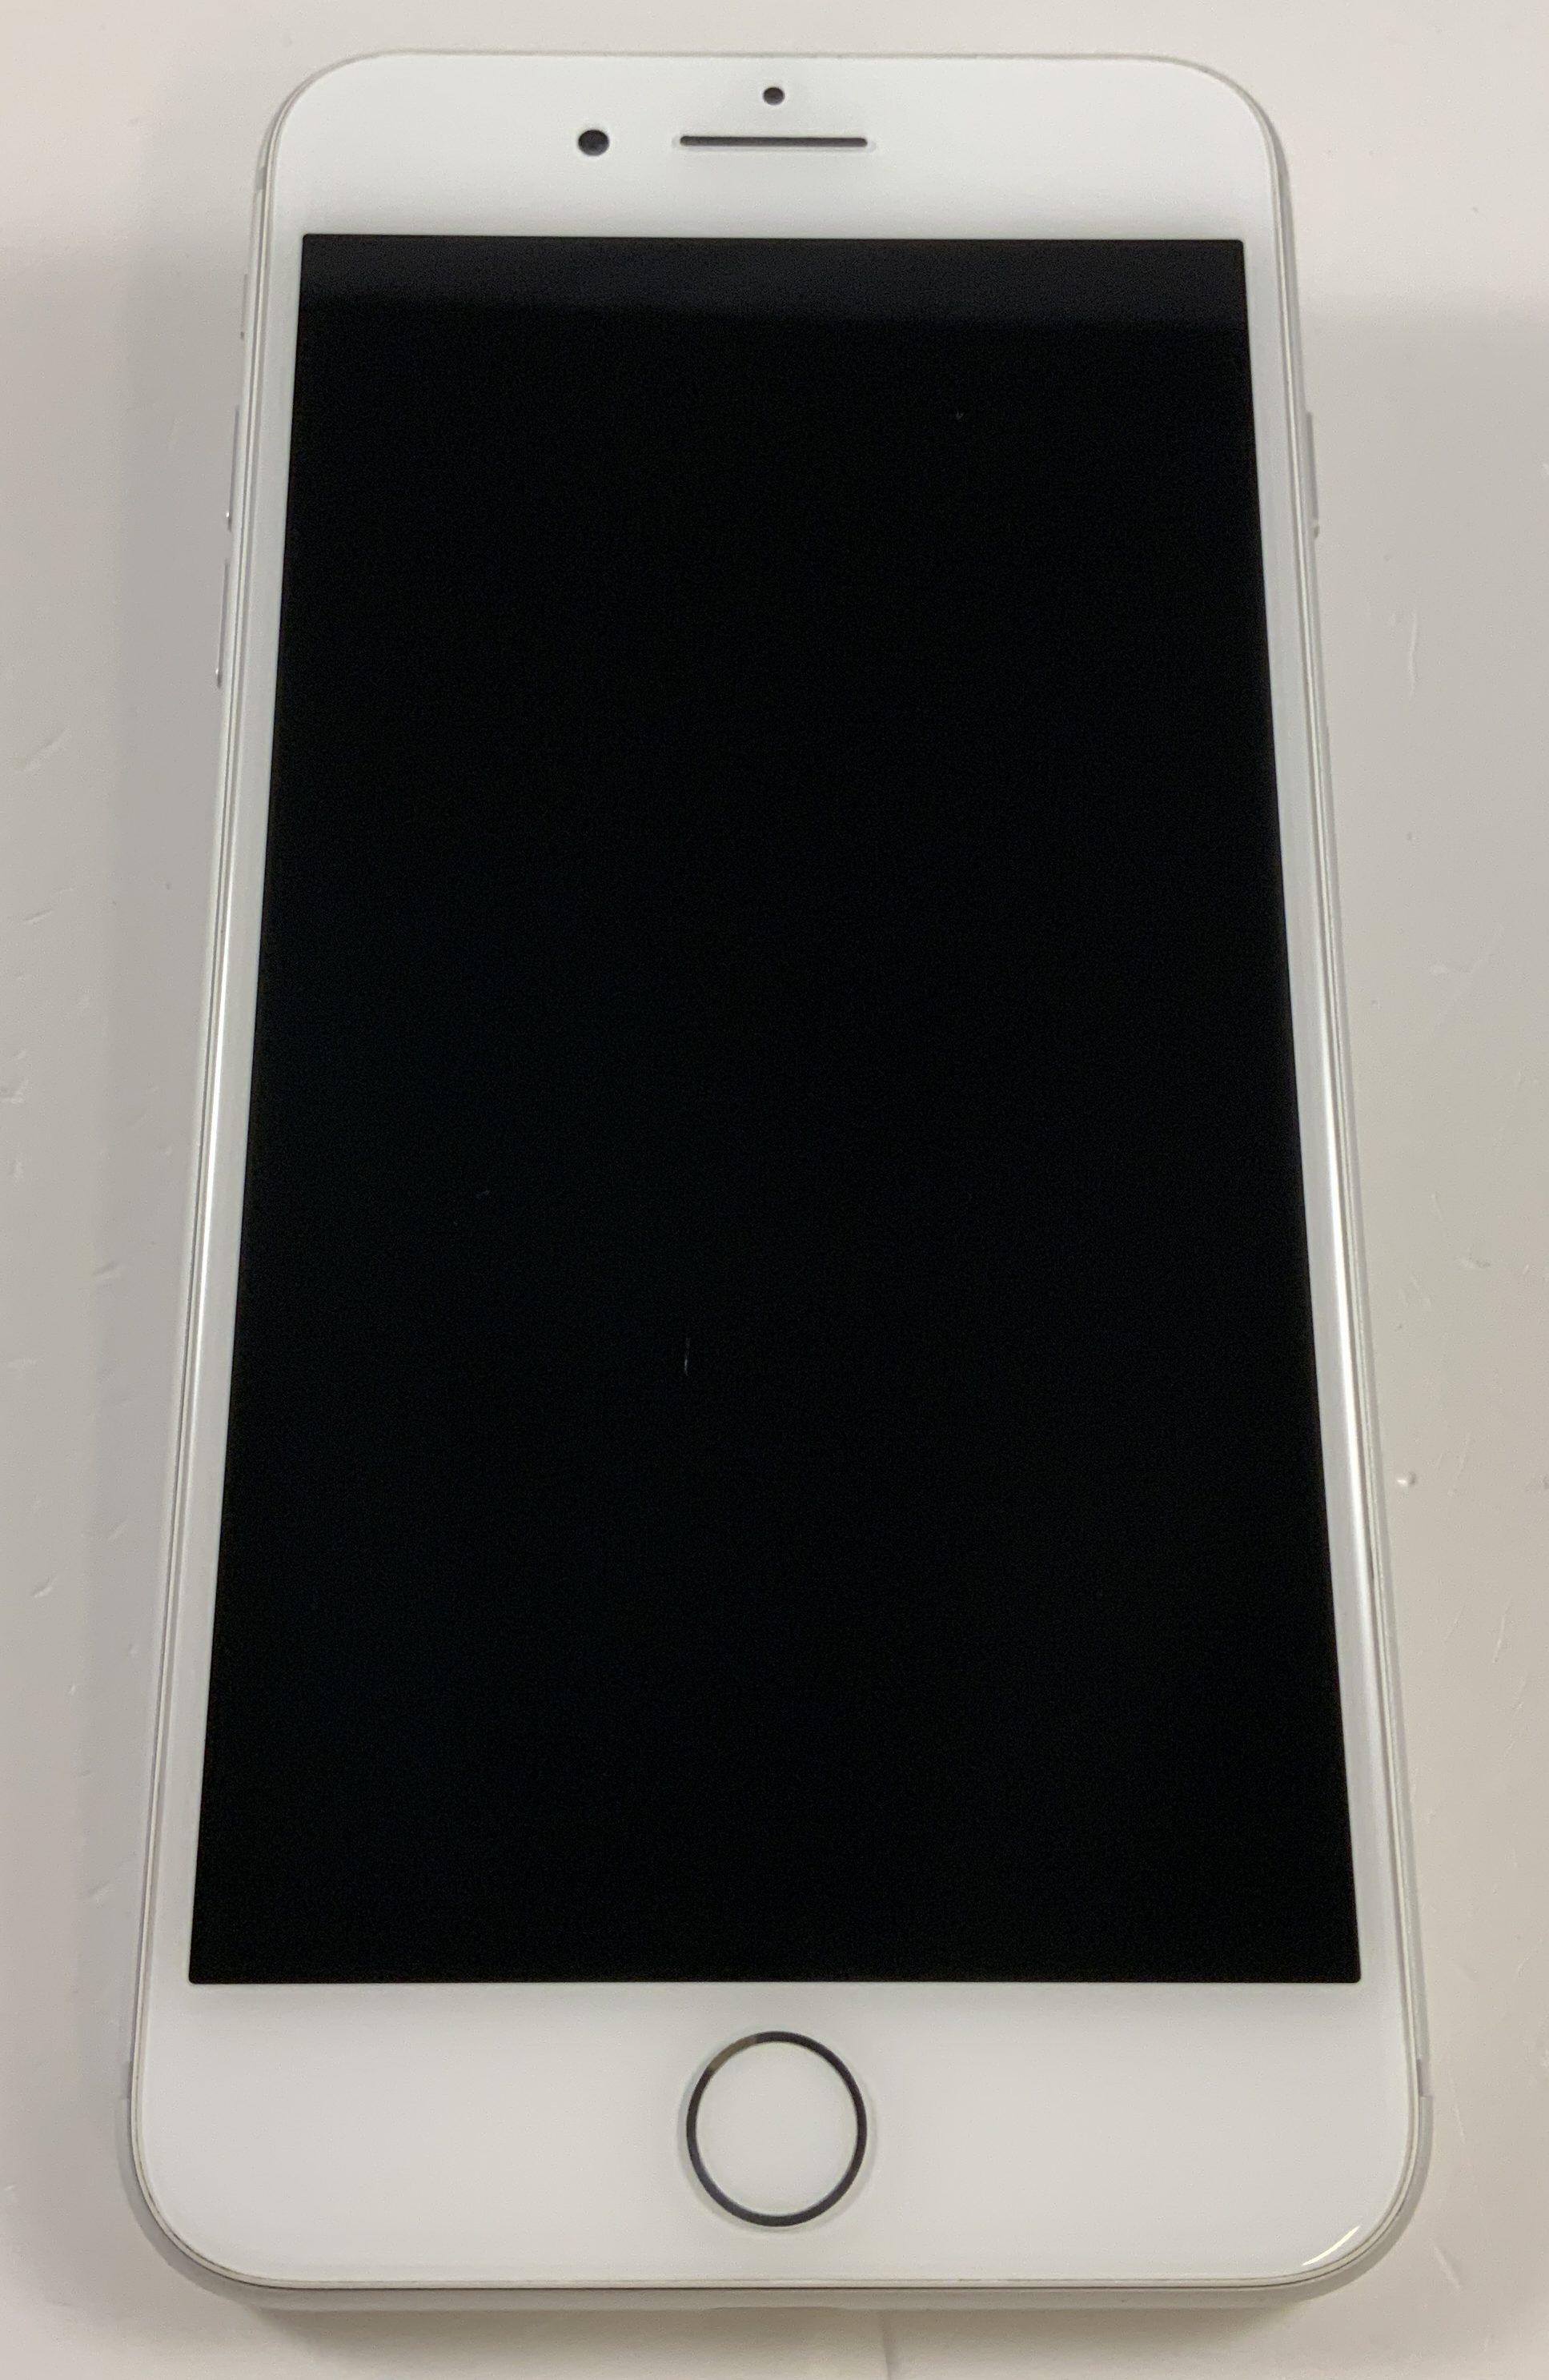 iPhone 8 Plus 256GB, 256GB, Silver, image 1